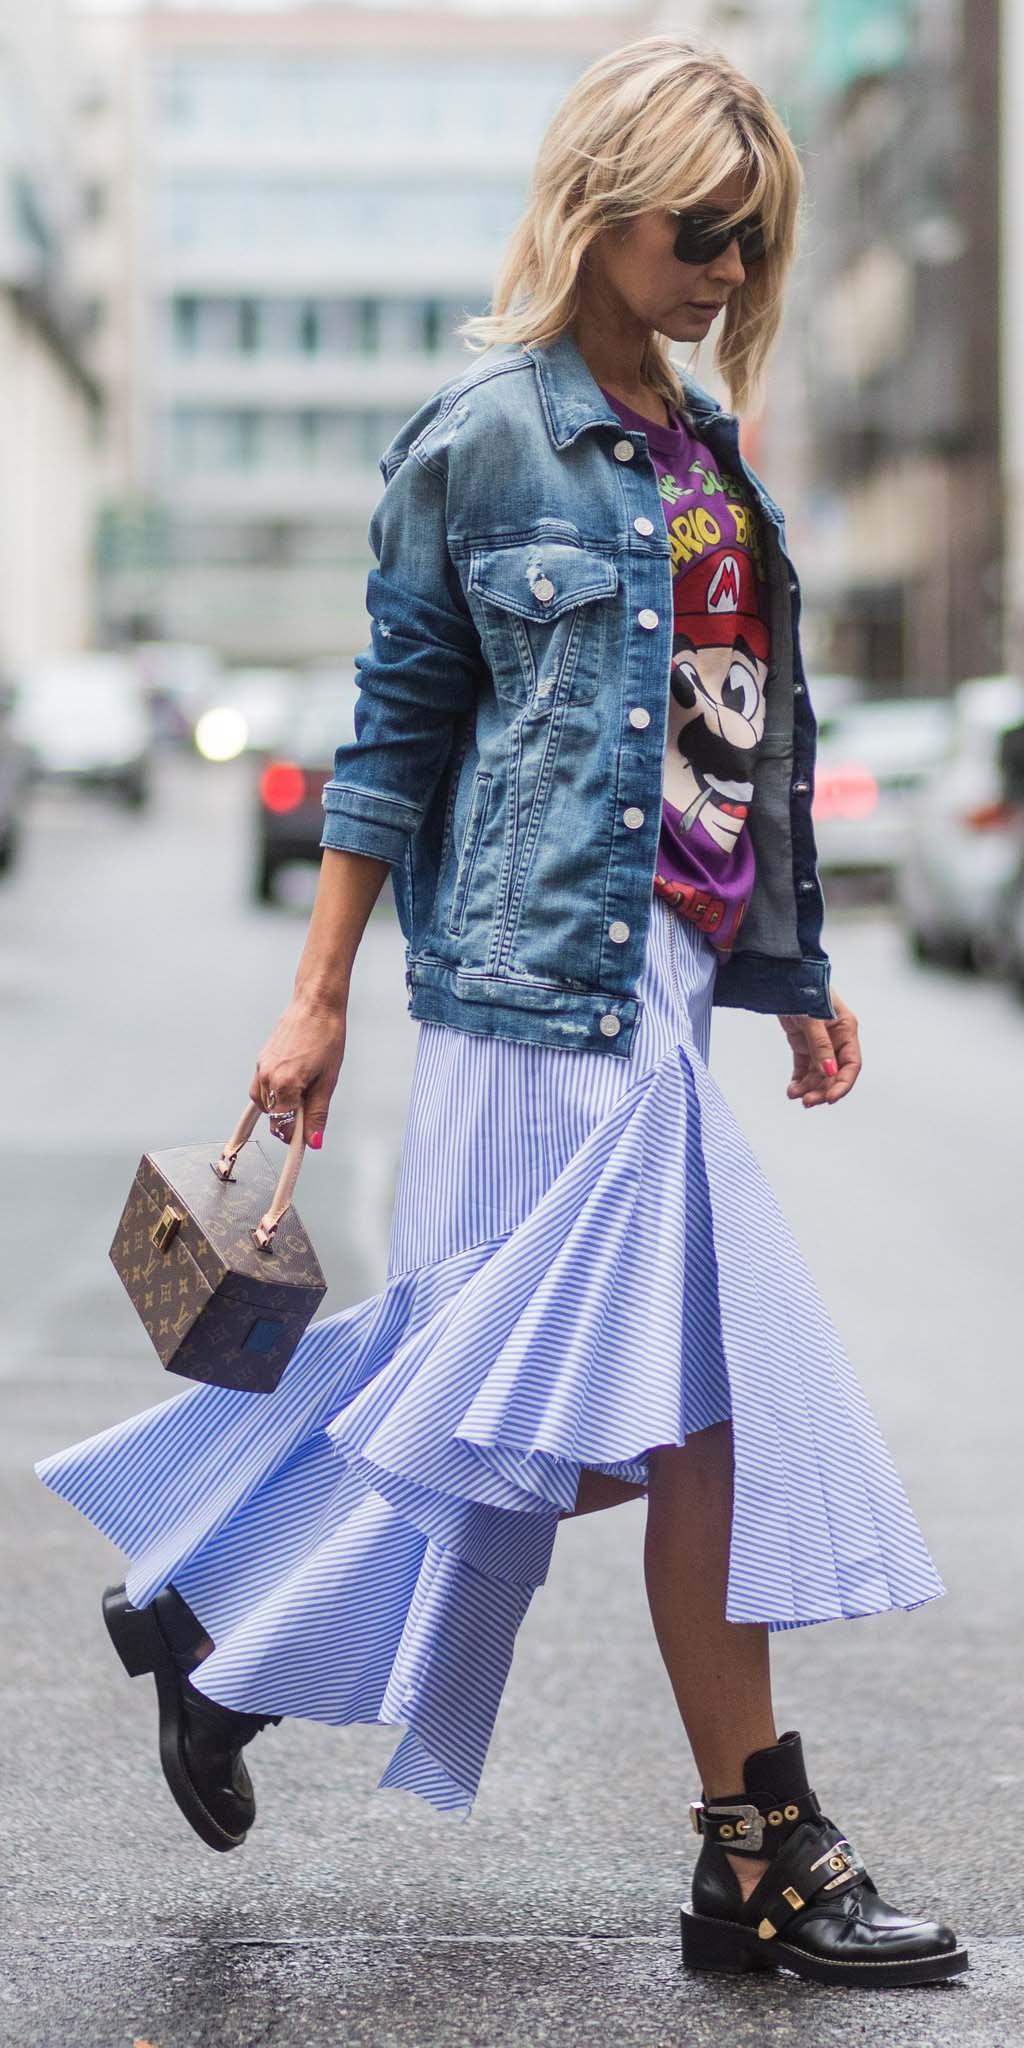 blue-light-midi-skirt-stripe-ruffle-purple-royal-graphic-tee-blue-med-jacket-jean-brown-bag-black-shoe-booties-fall-winter-blonde-weekend.jpg